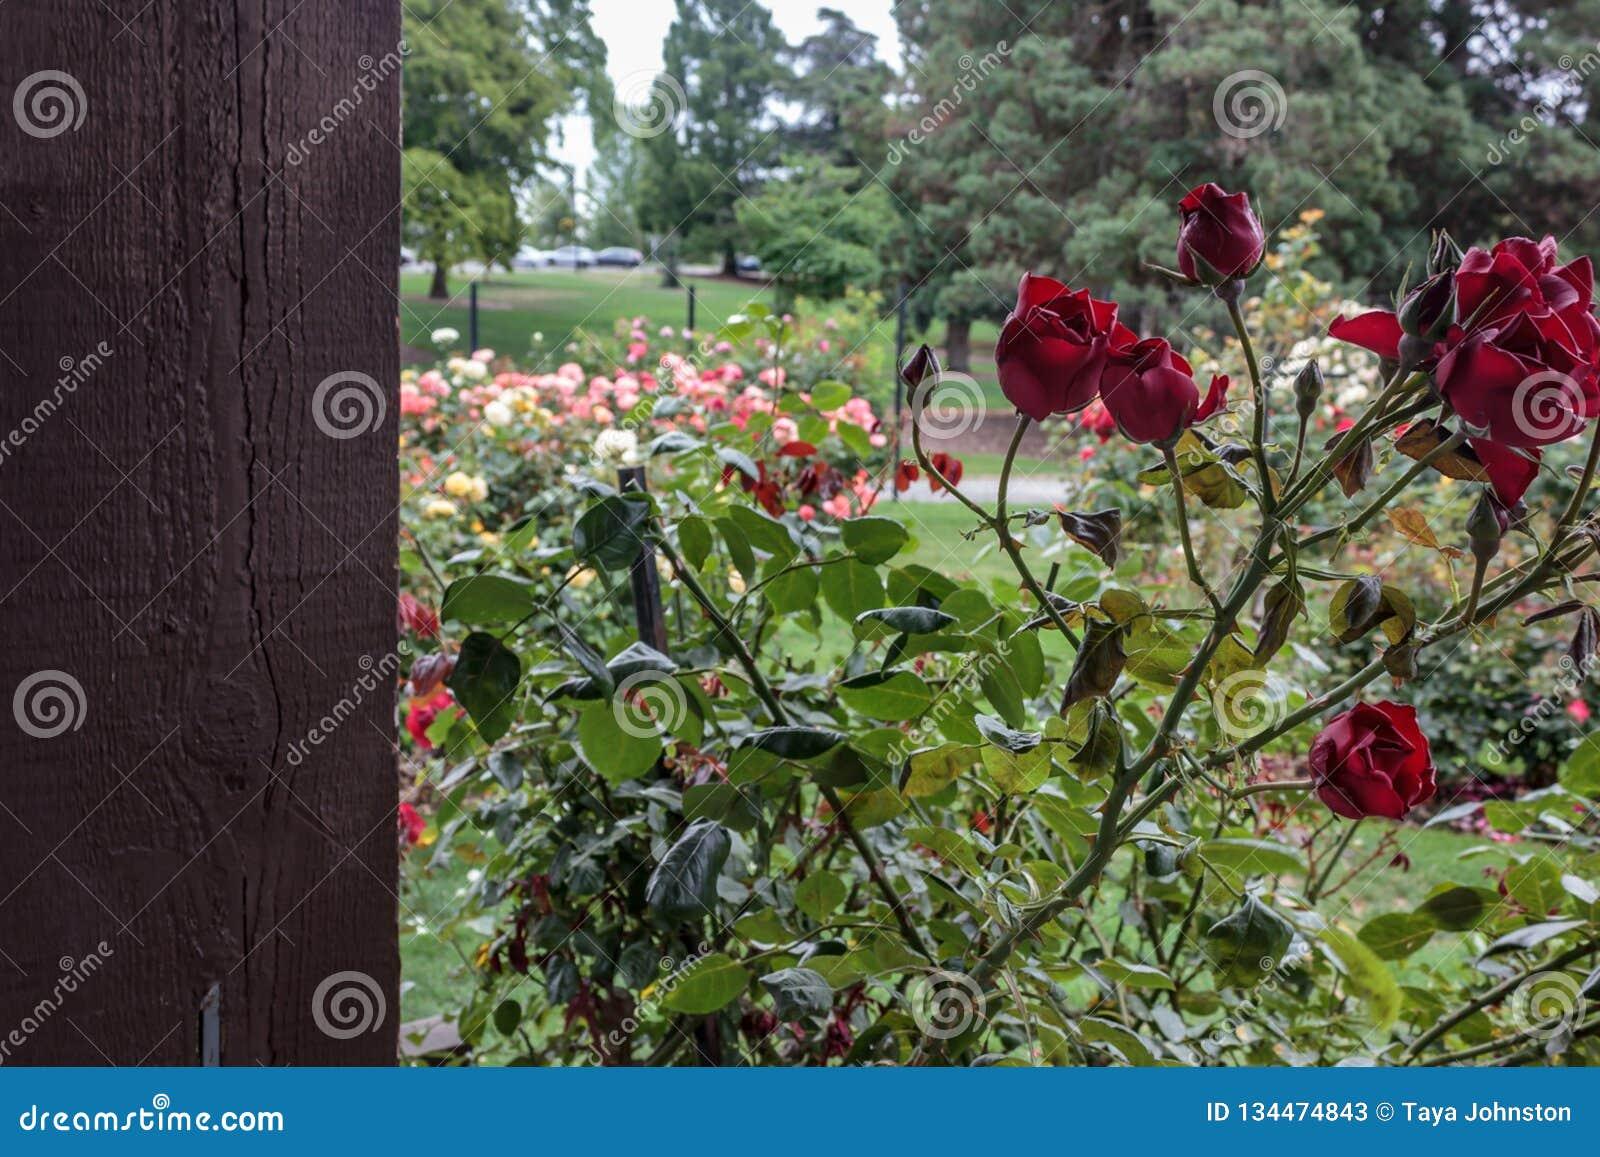 Deep red rosed near large rose garden. Deep red rosed near multiple colored rose gardenin summer stock photos